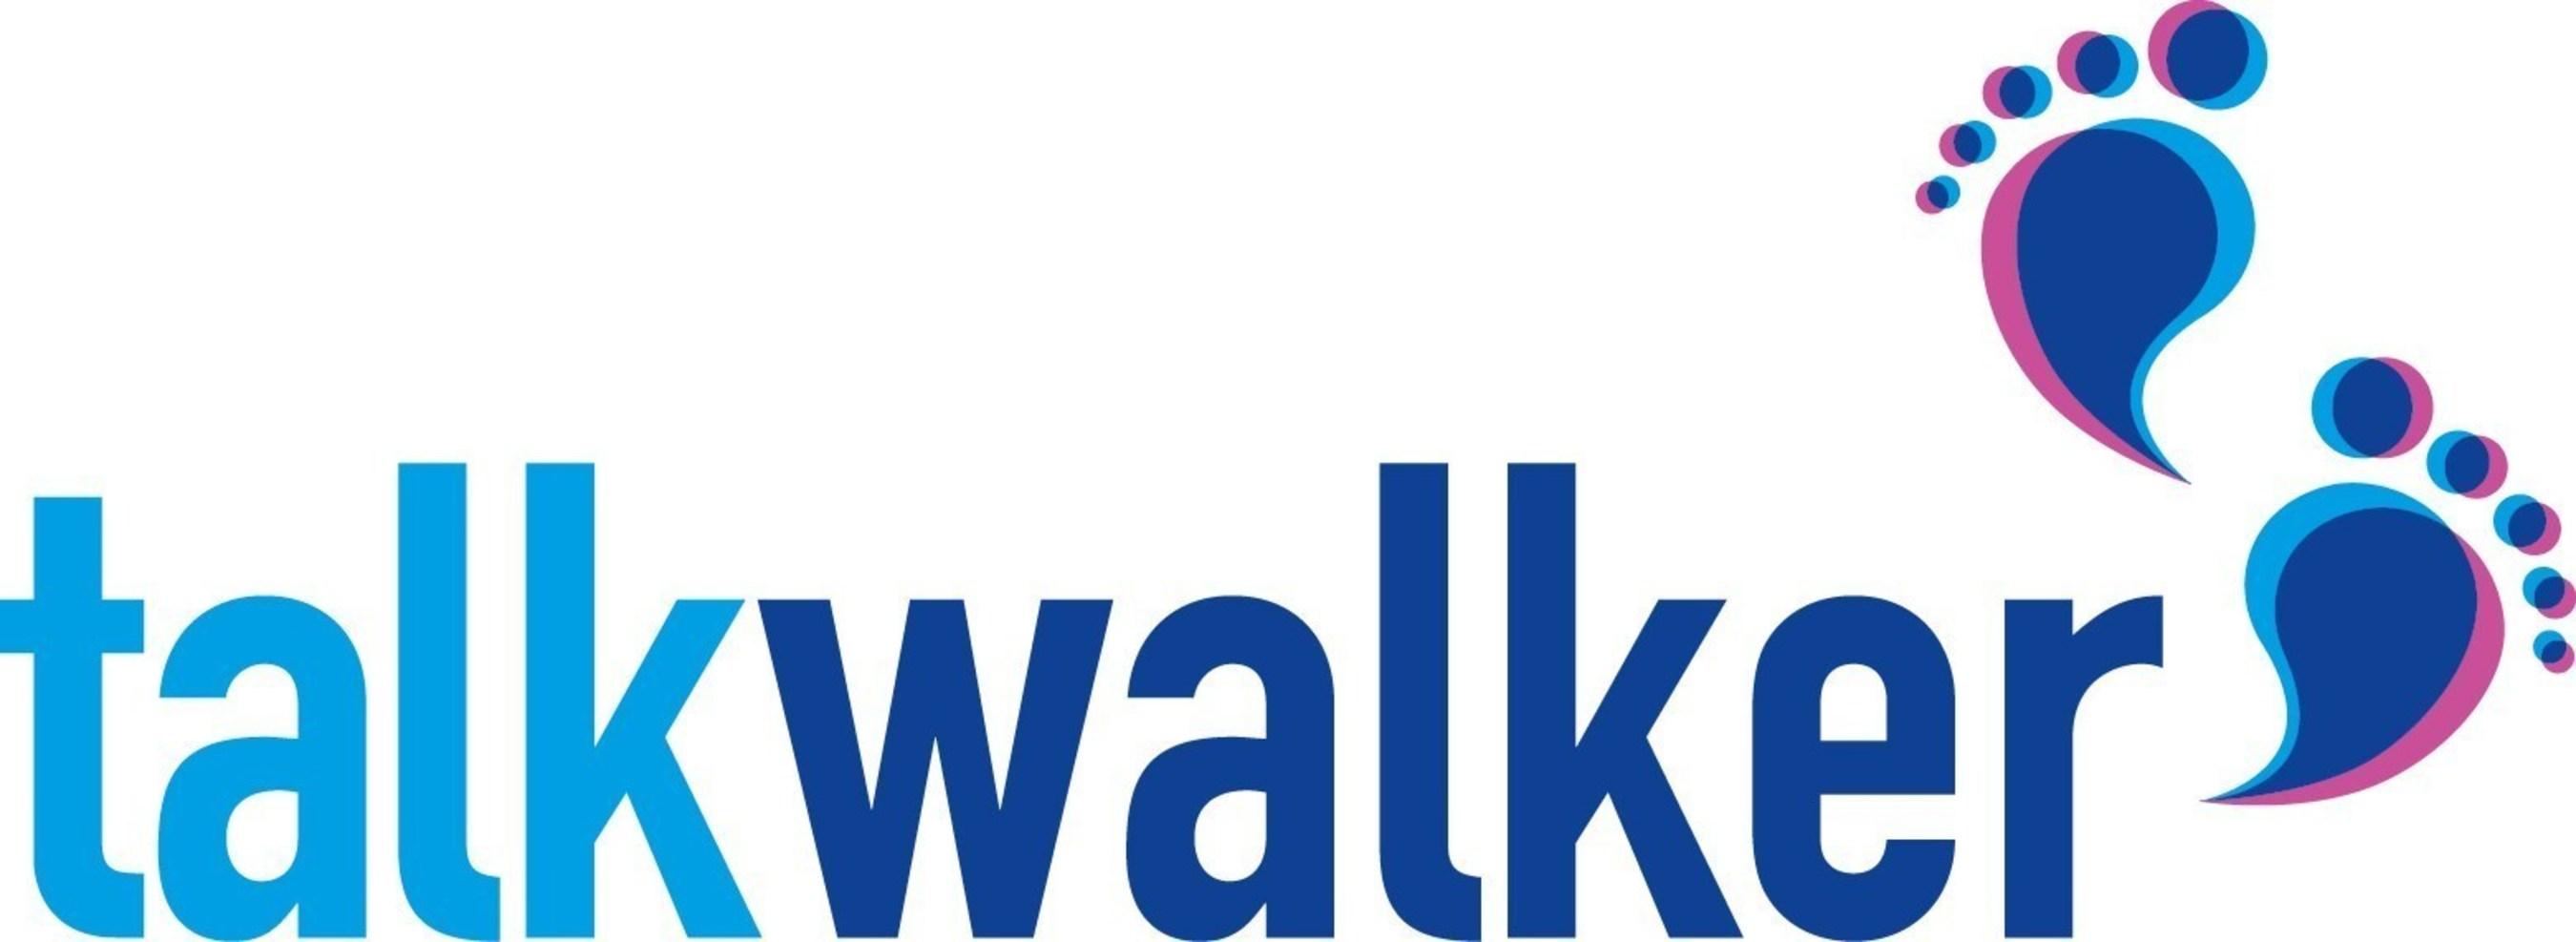 Talkwalker - Put Social Data Intelligence To Work